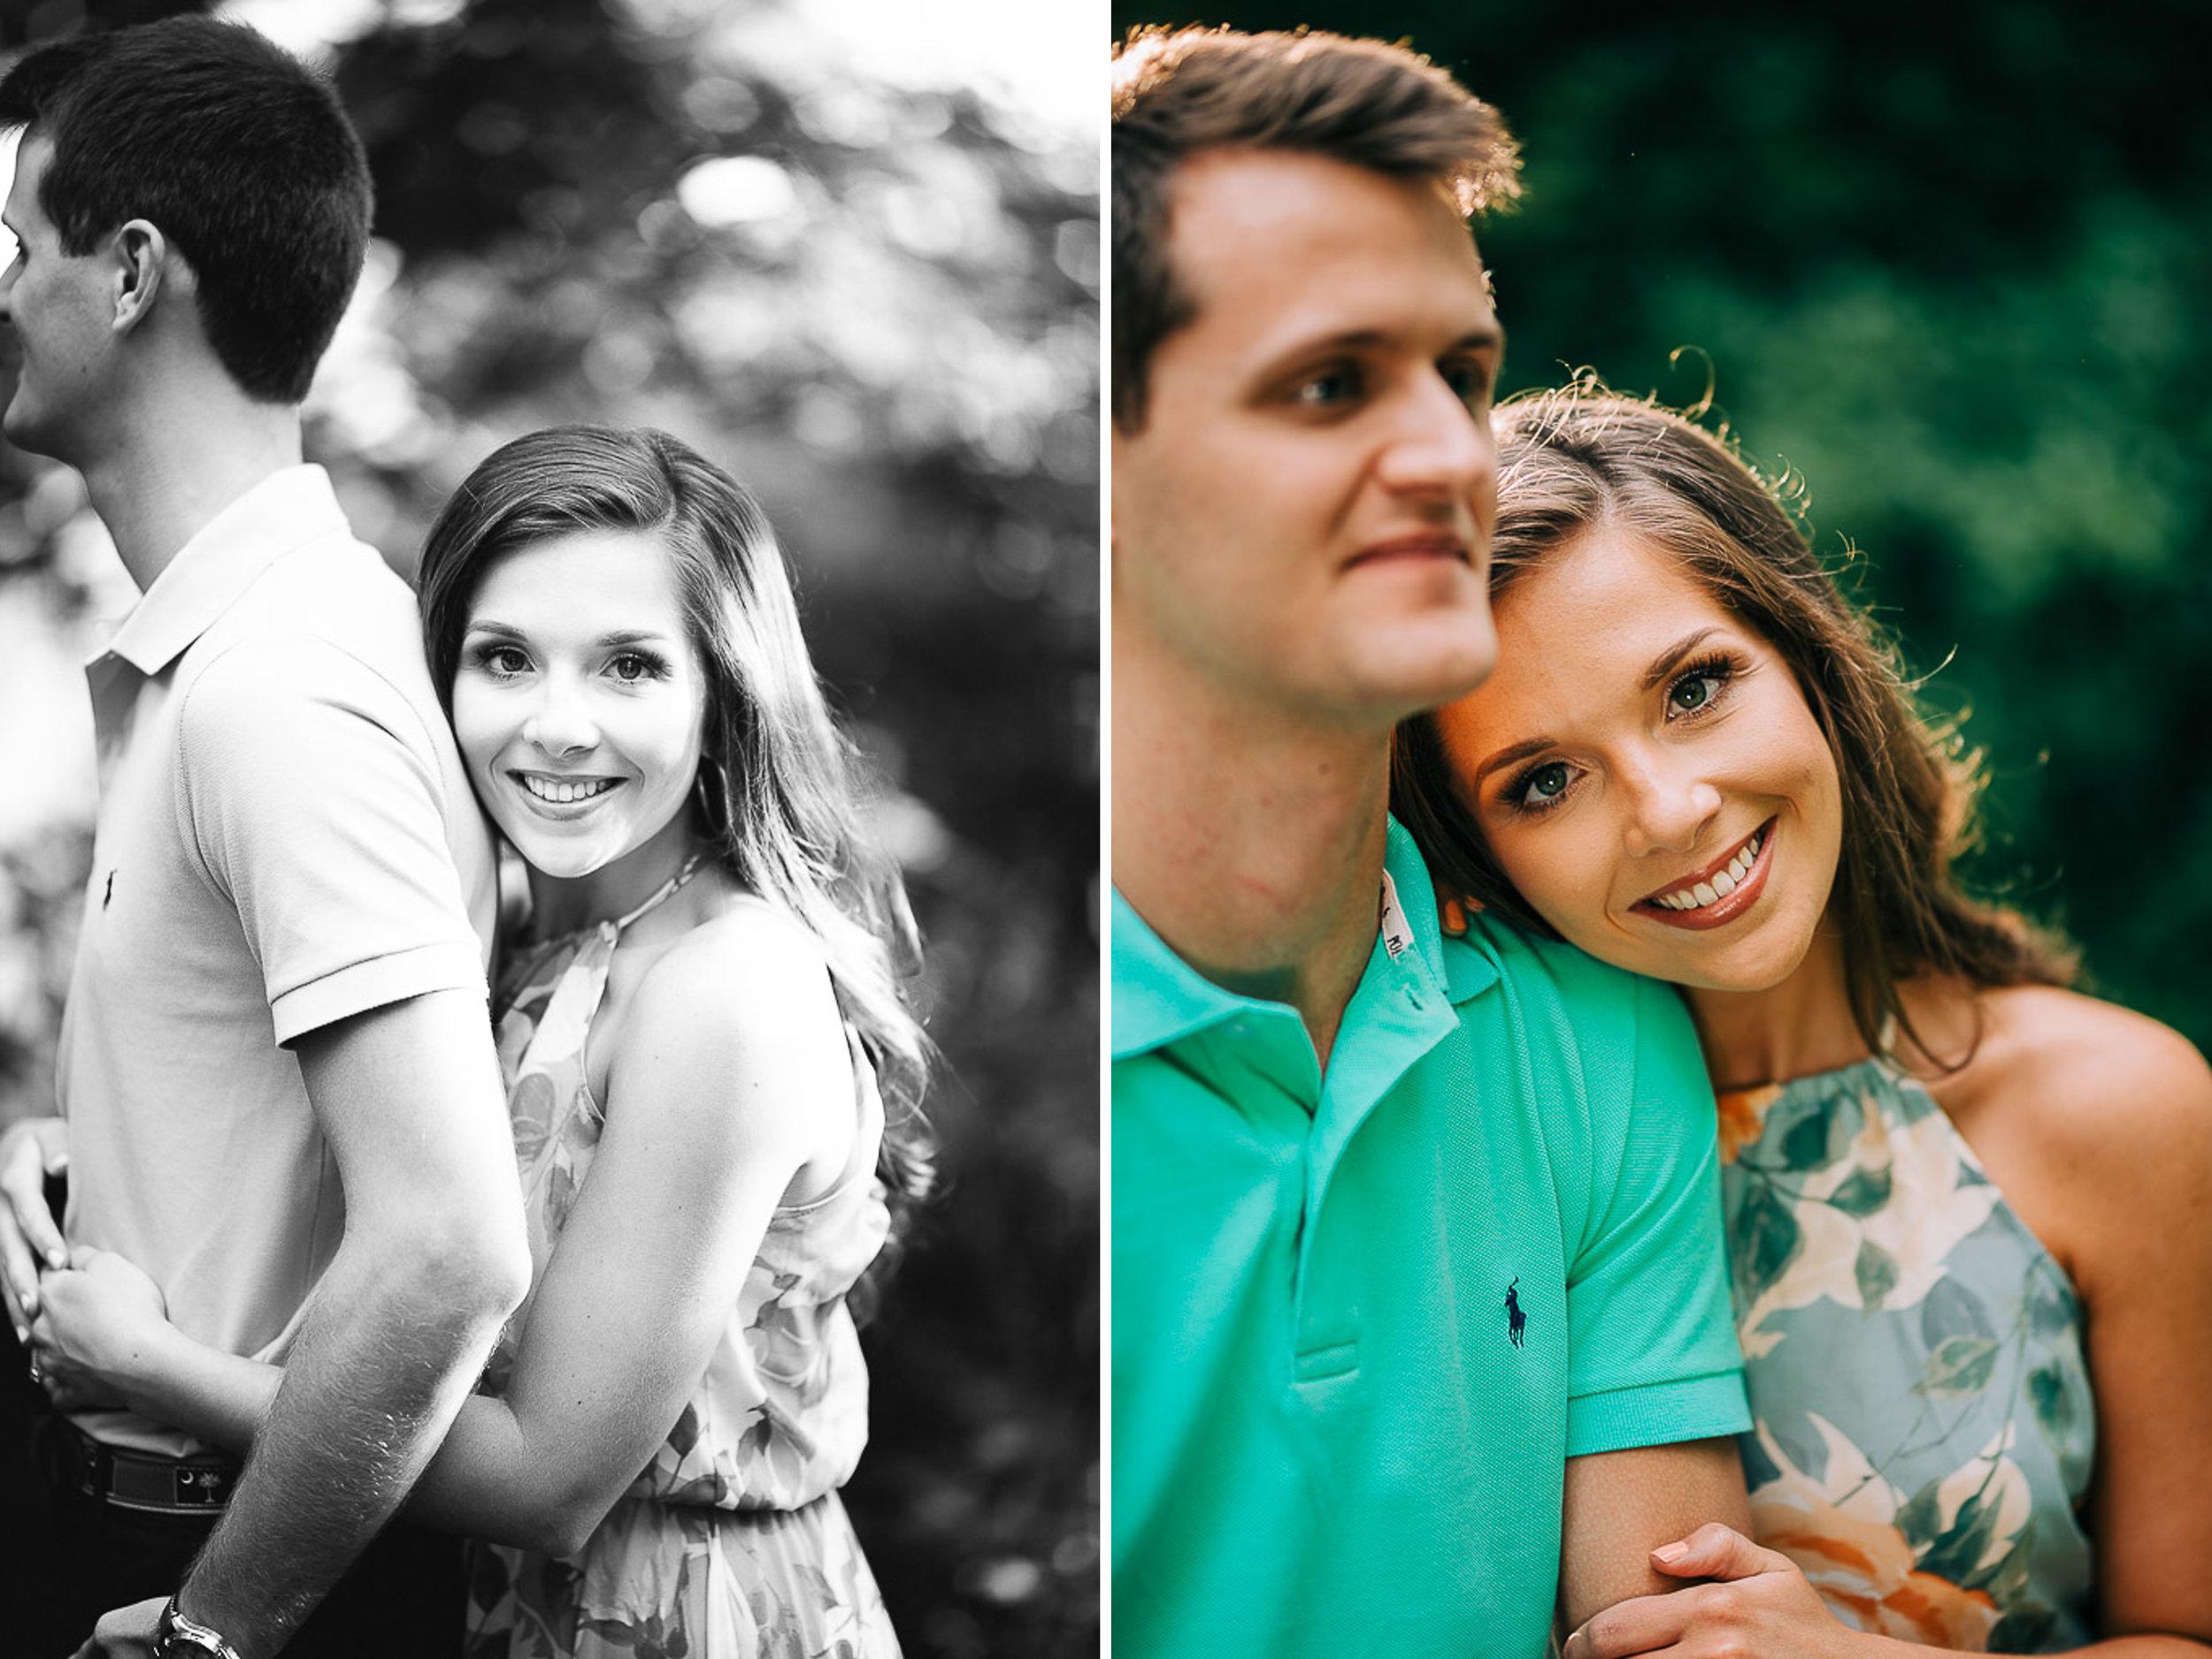 Mountain Engagement Portraits, Summer, SC Wedding Photographers, 01.jpg